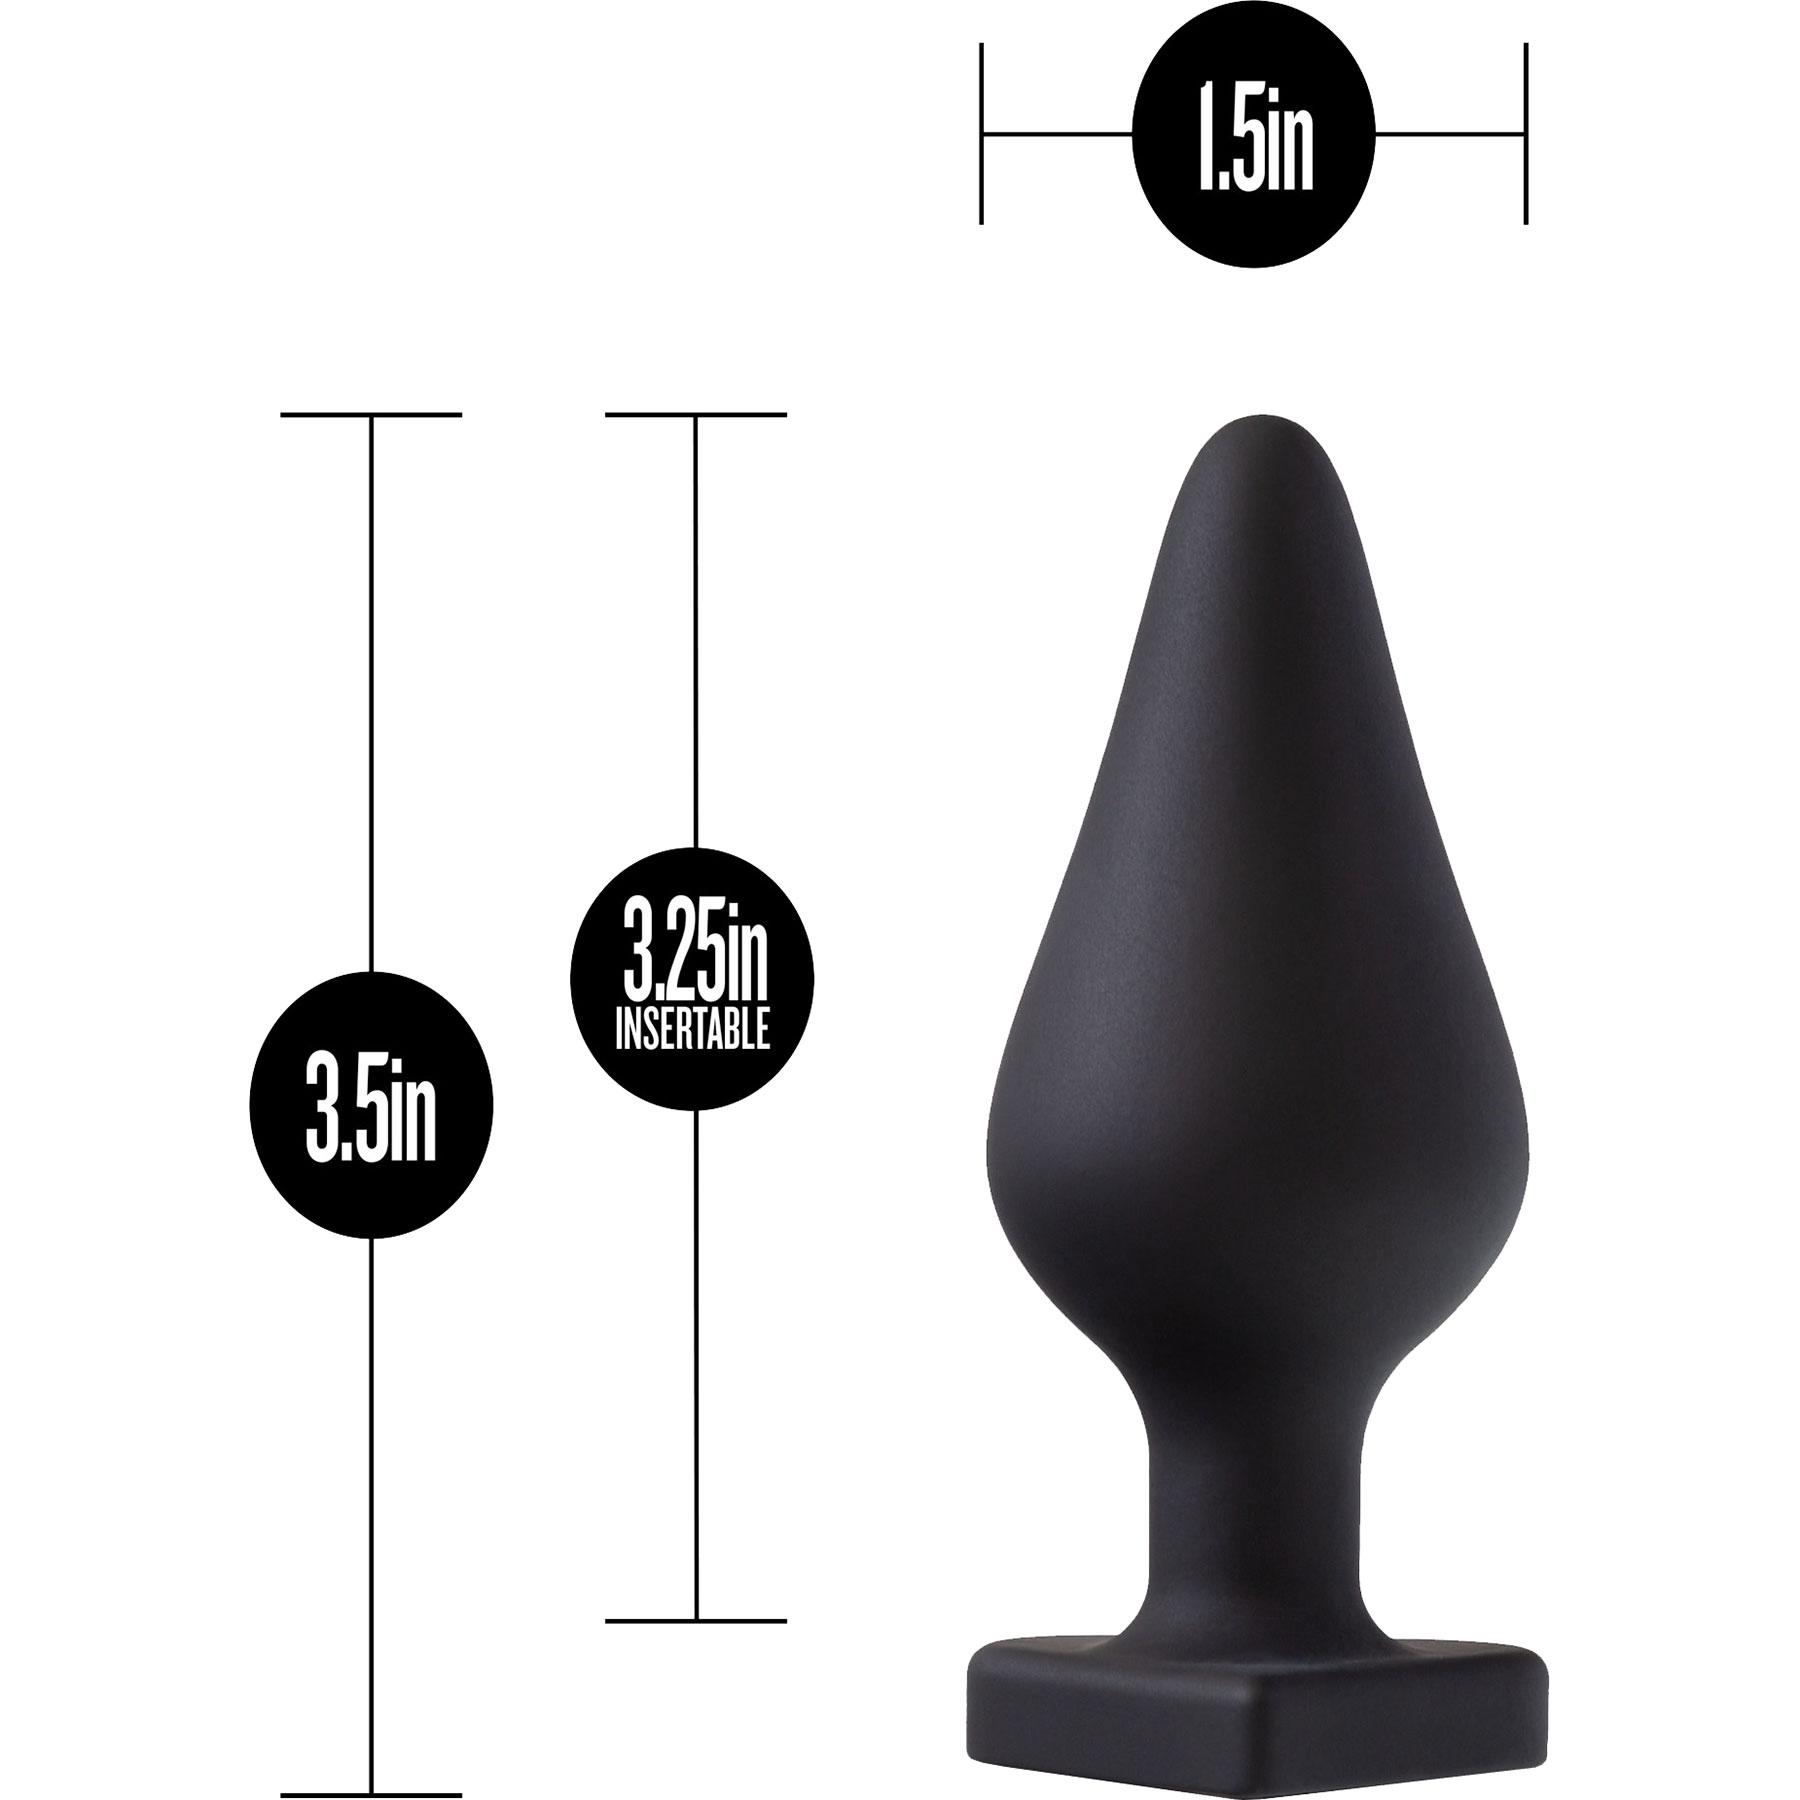 Temptasia Spank Me Silicone Butt Plug By Blush - Measurements